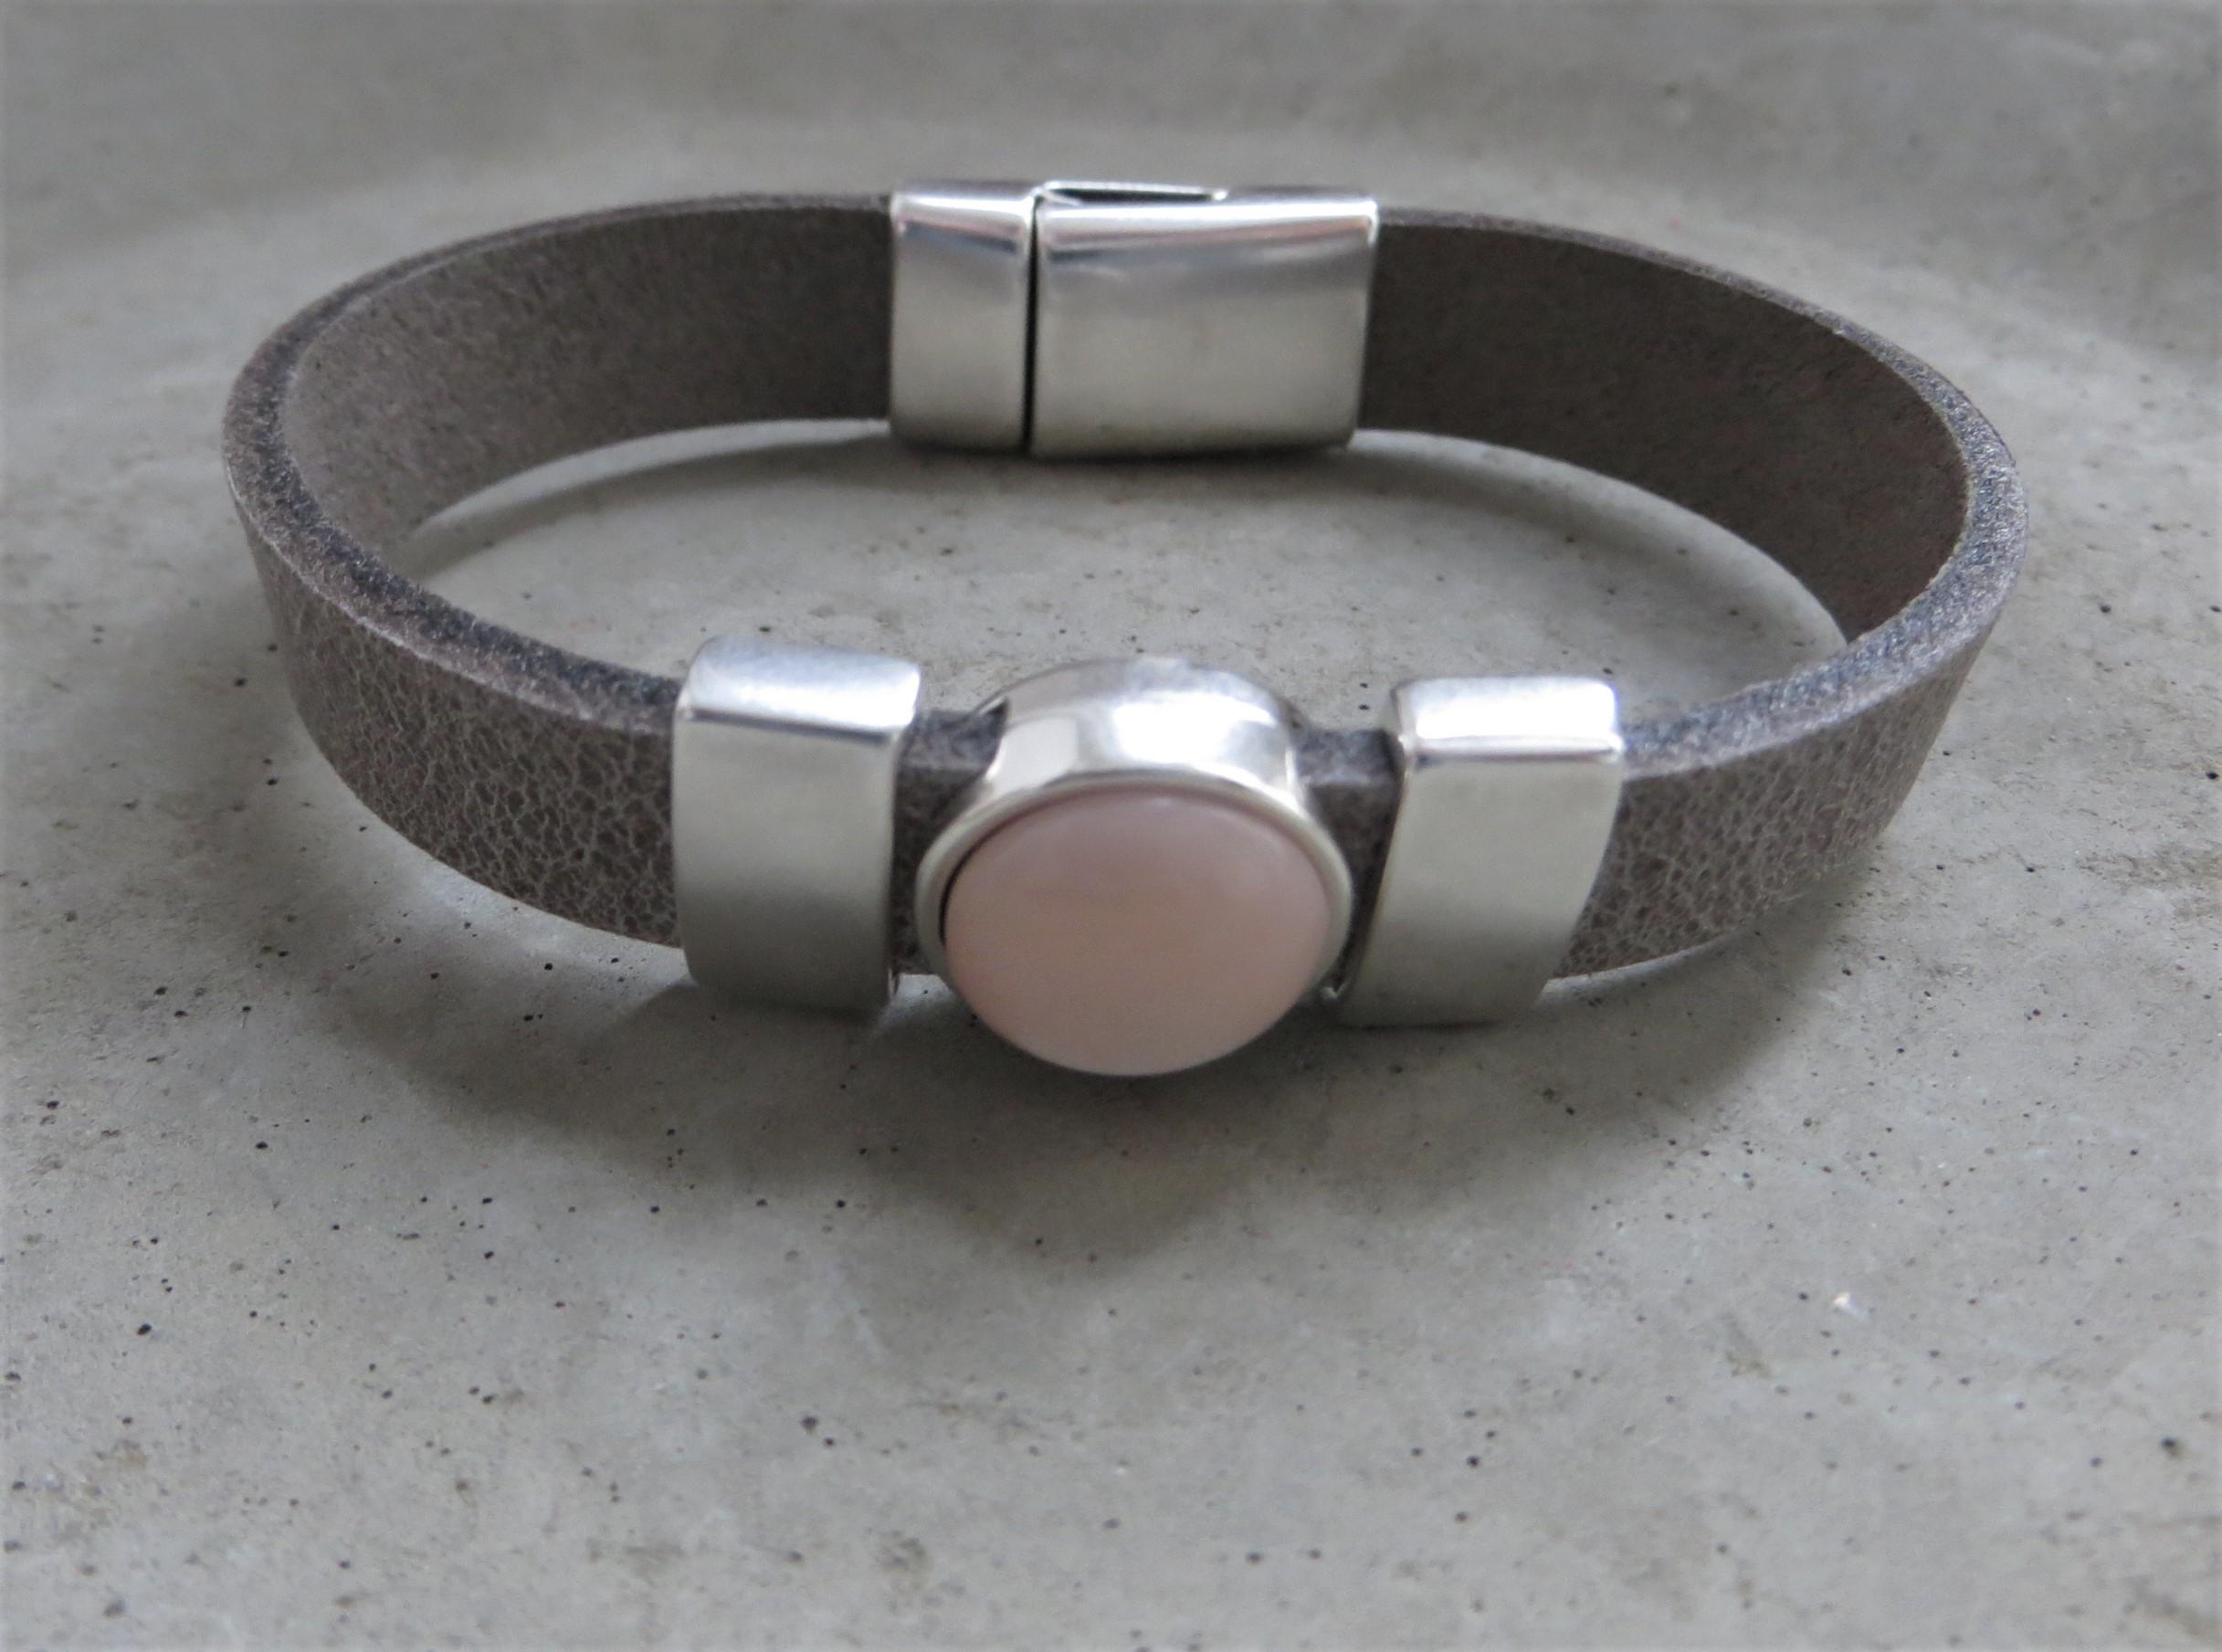 Armbaender - QOSS Armband KIM Grau Puderrosa M  - Onlineshop Tante Emmer